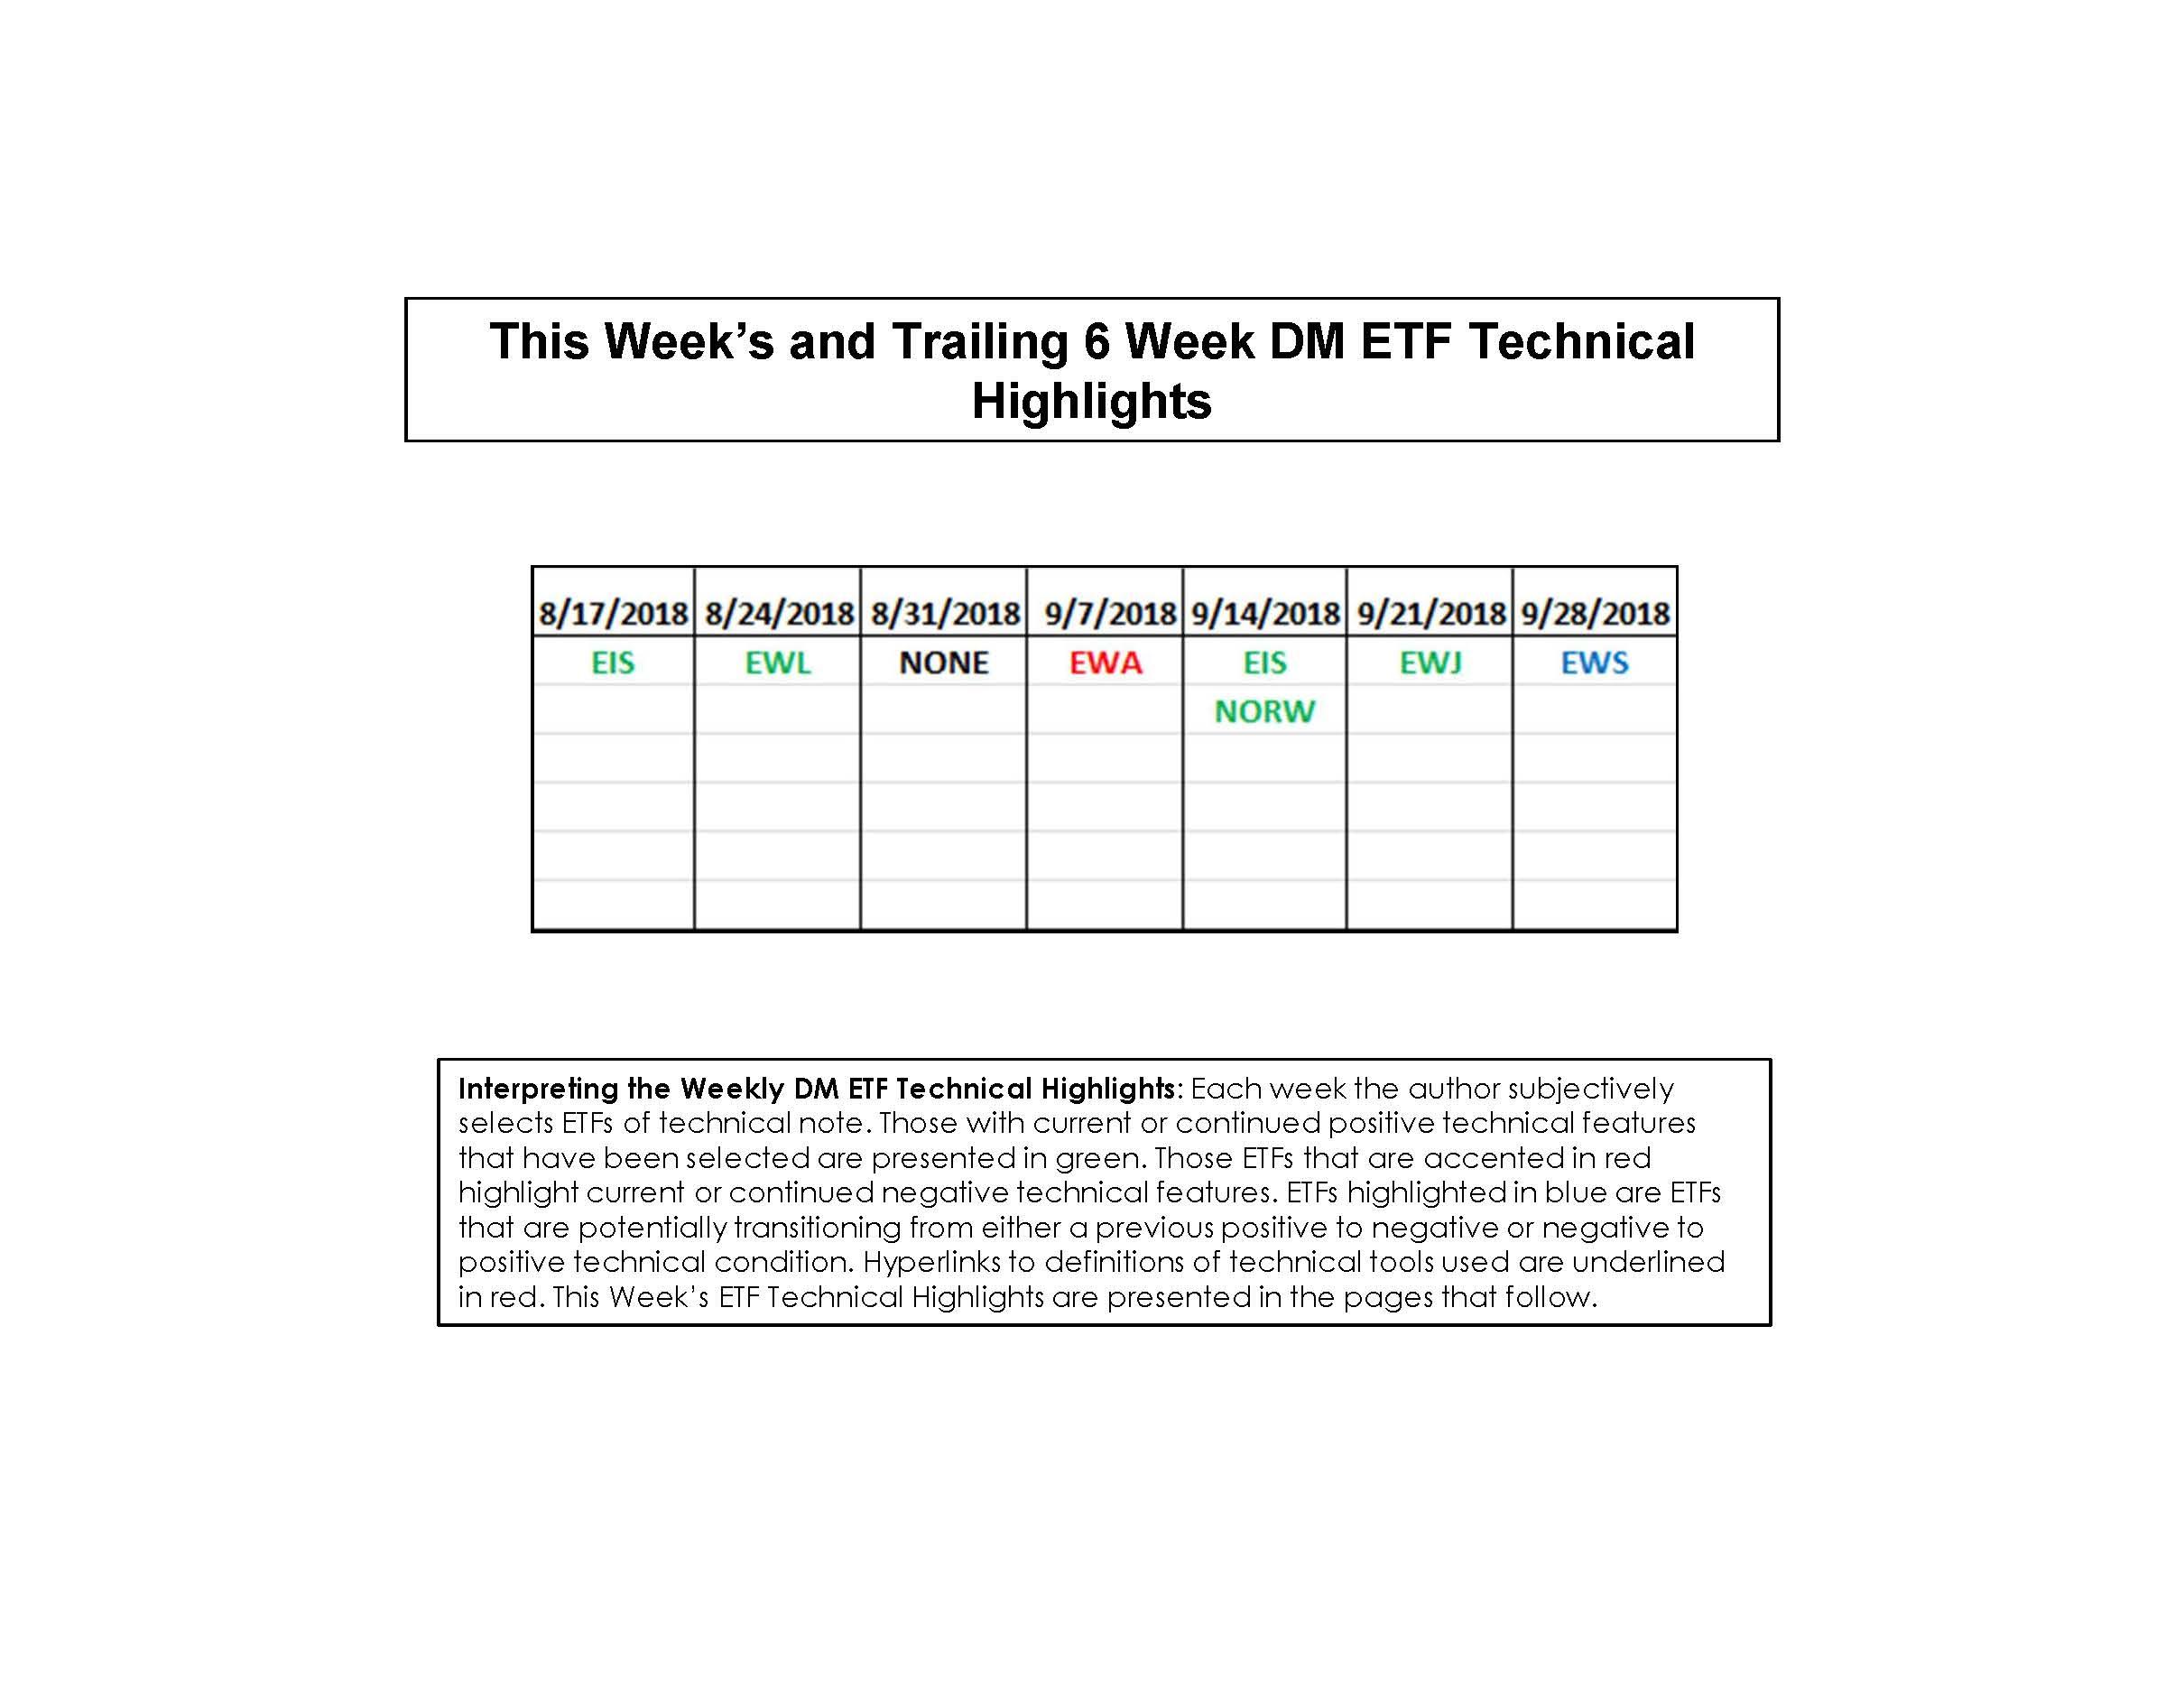 10-1-18_MarketsETF_Page_6.jpg